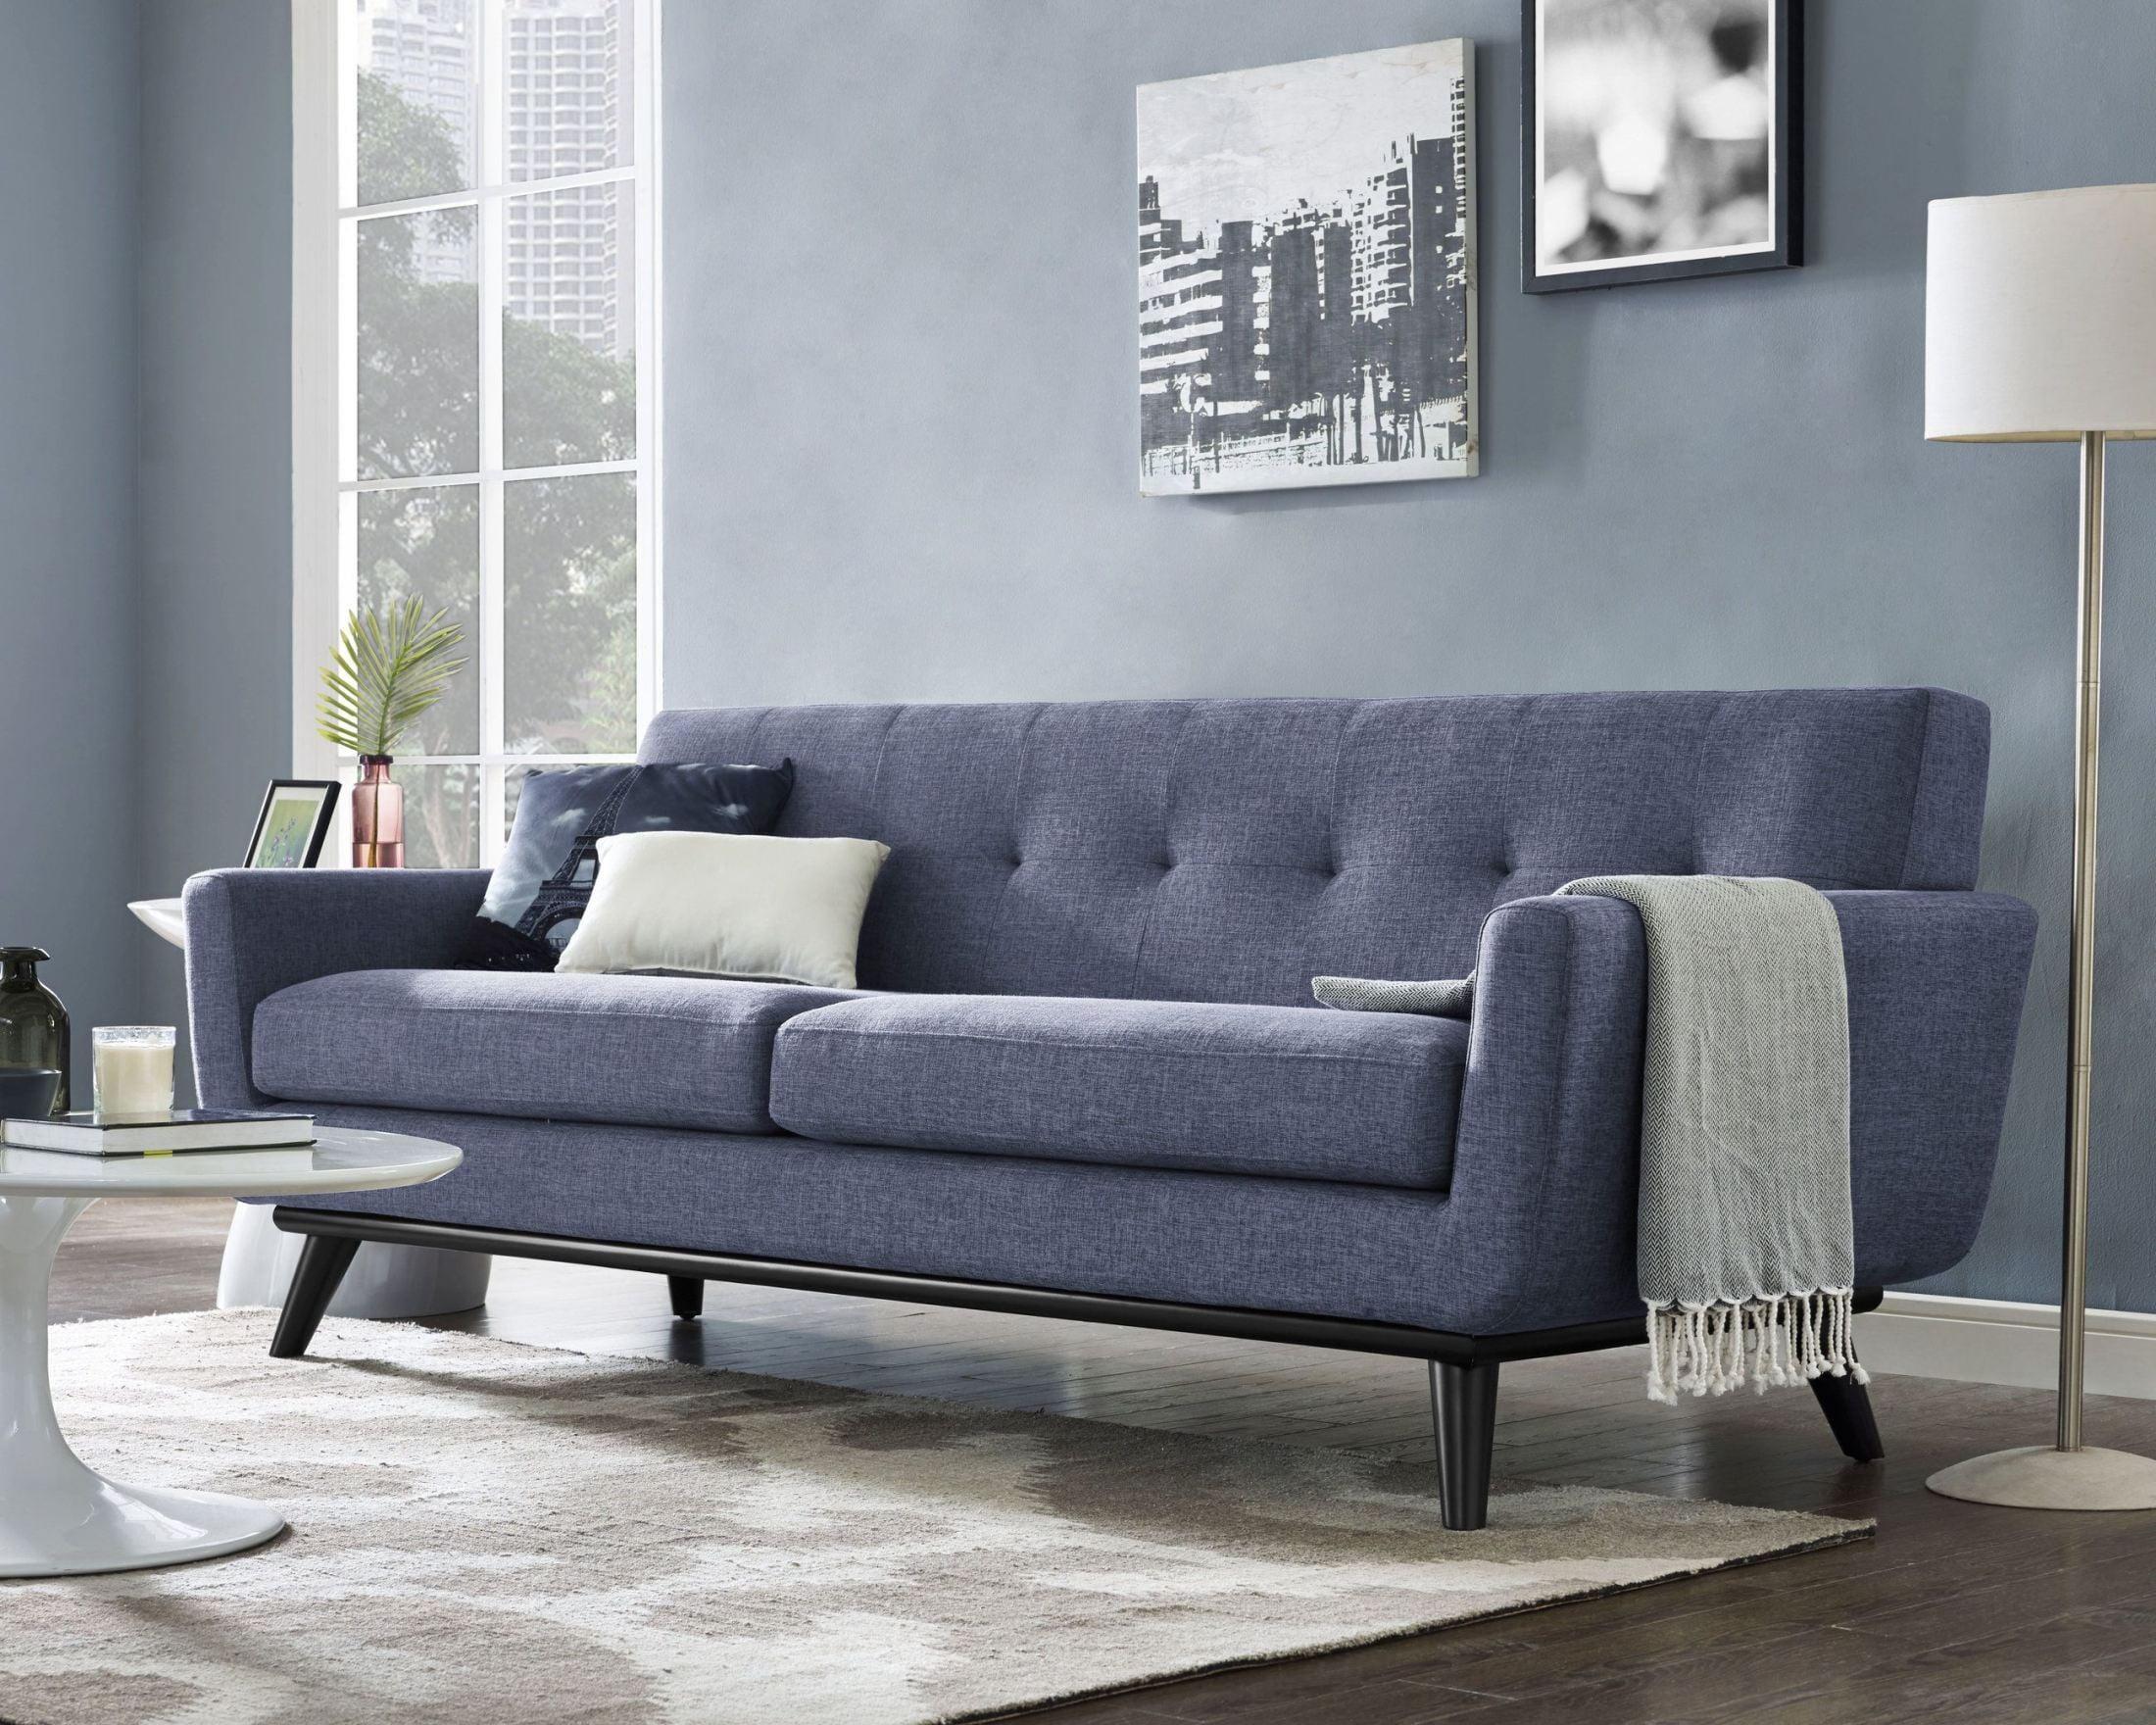 James blue linen living room set from tov coleman furniture for Blue living room furniture ideas